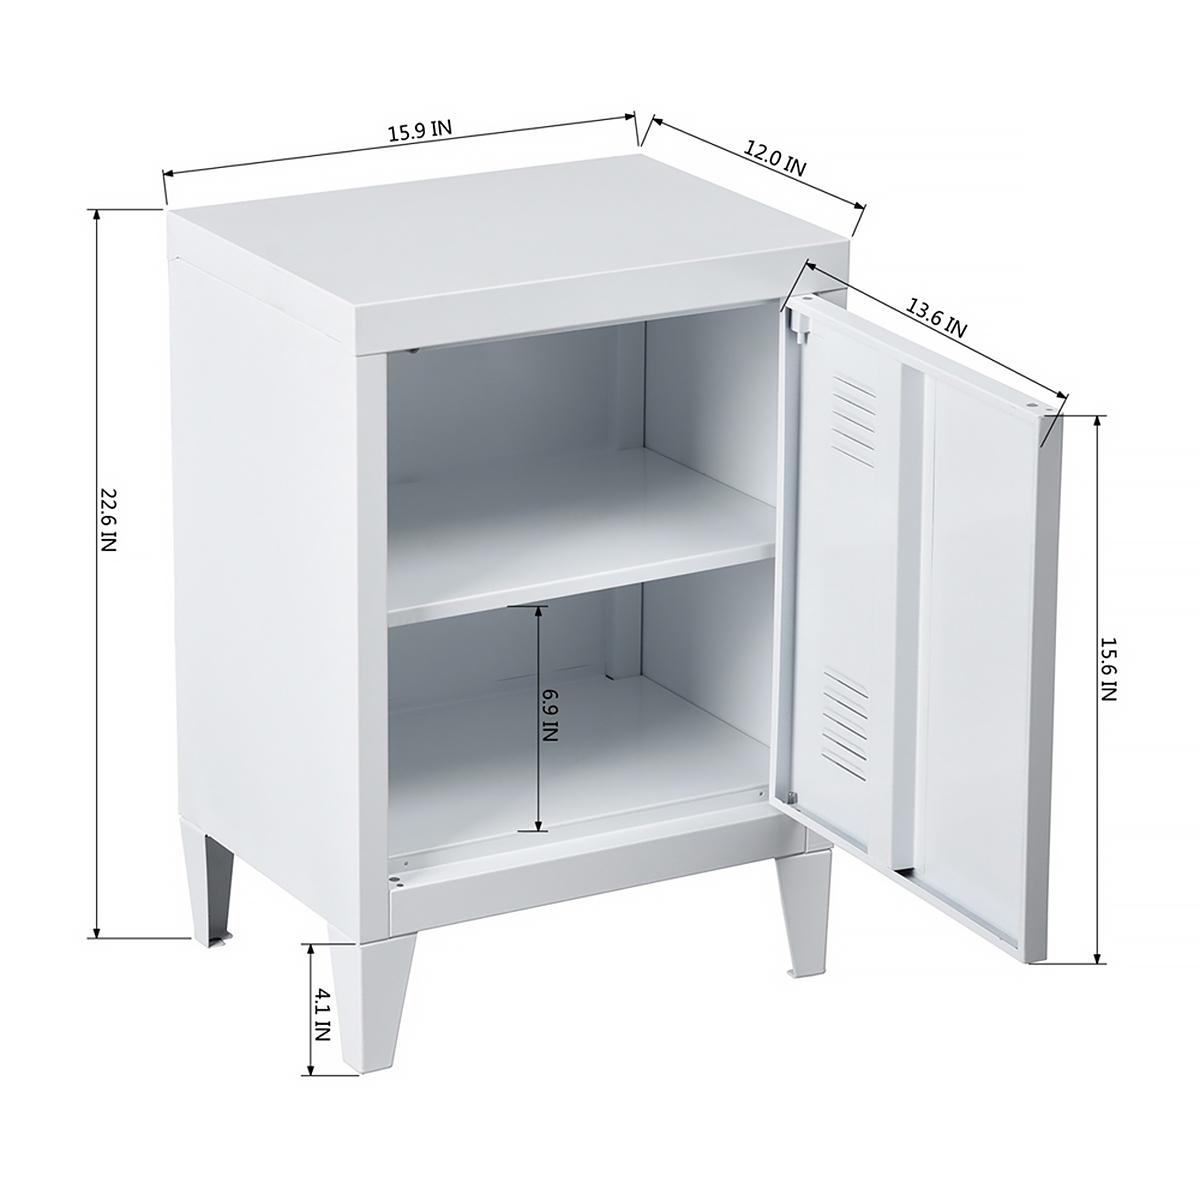 HouseinBox Low Standing Locker Organizer Side End Table Office File Storage Metal Cabinet Cupboard Unit Detachable 4 Legs,Size:15.9 x 12 x 22.6 Black